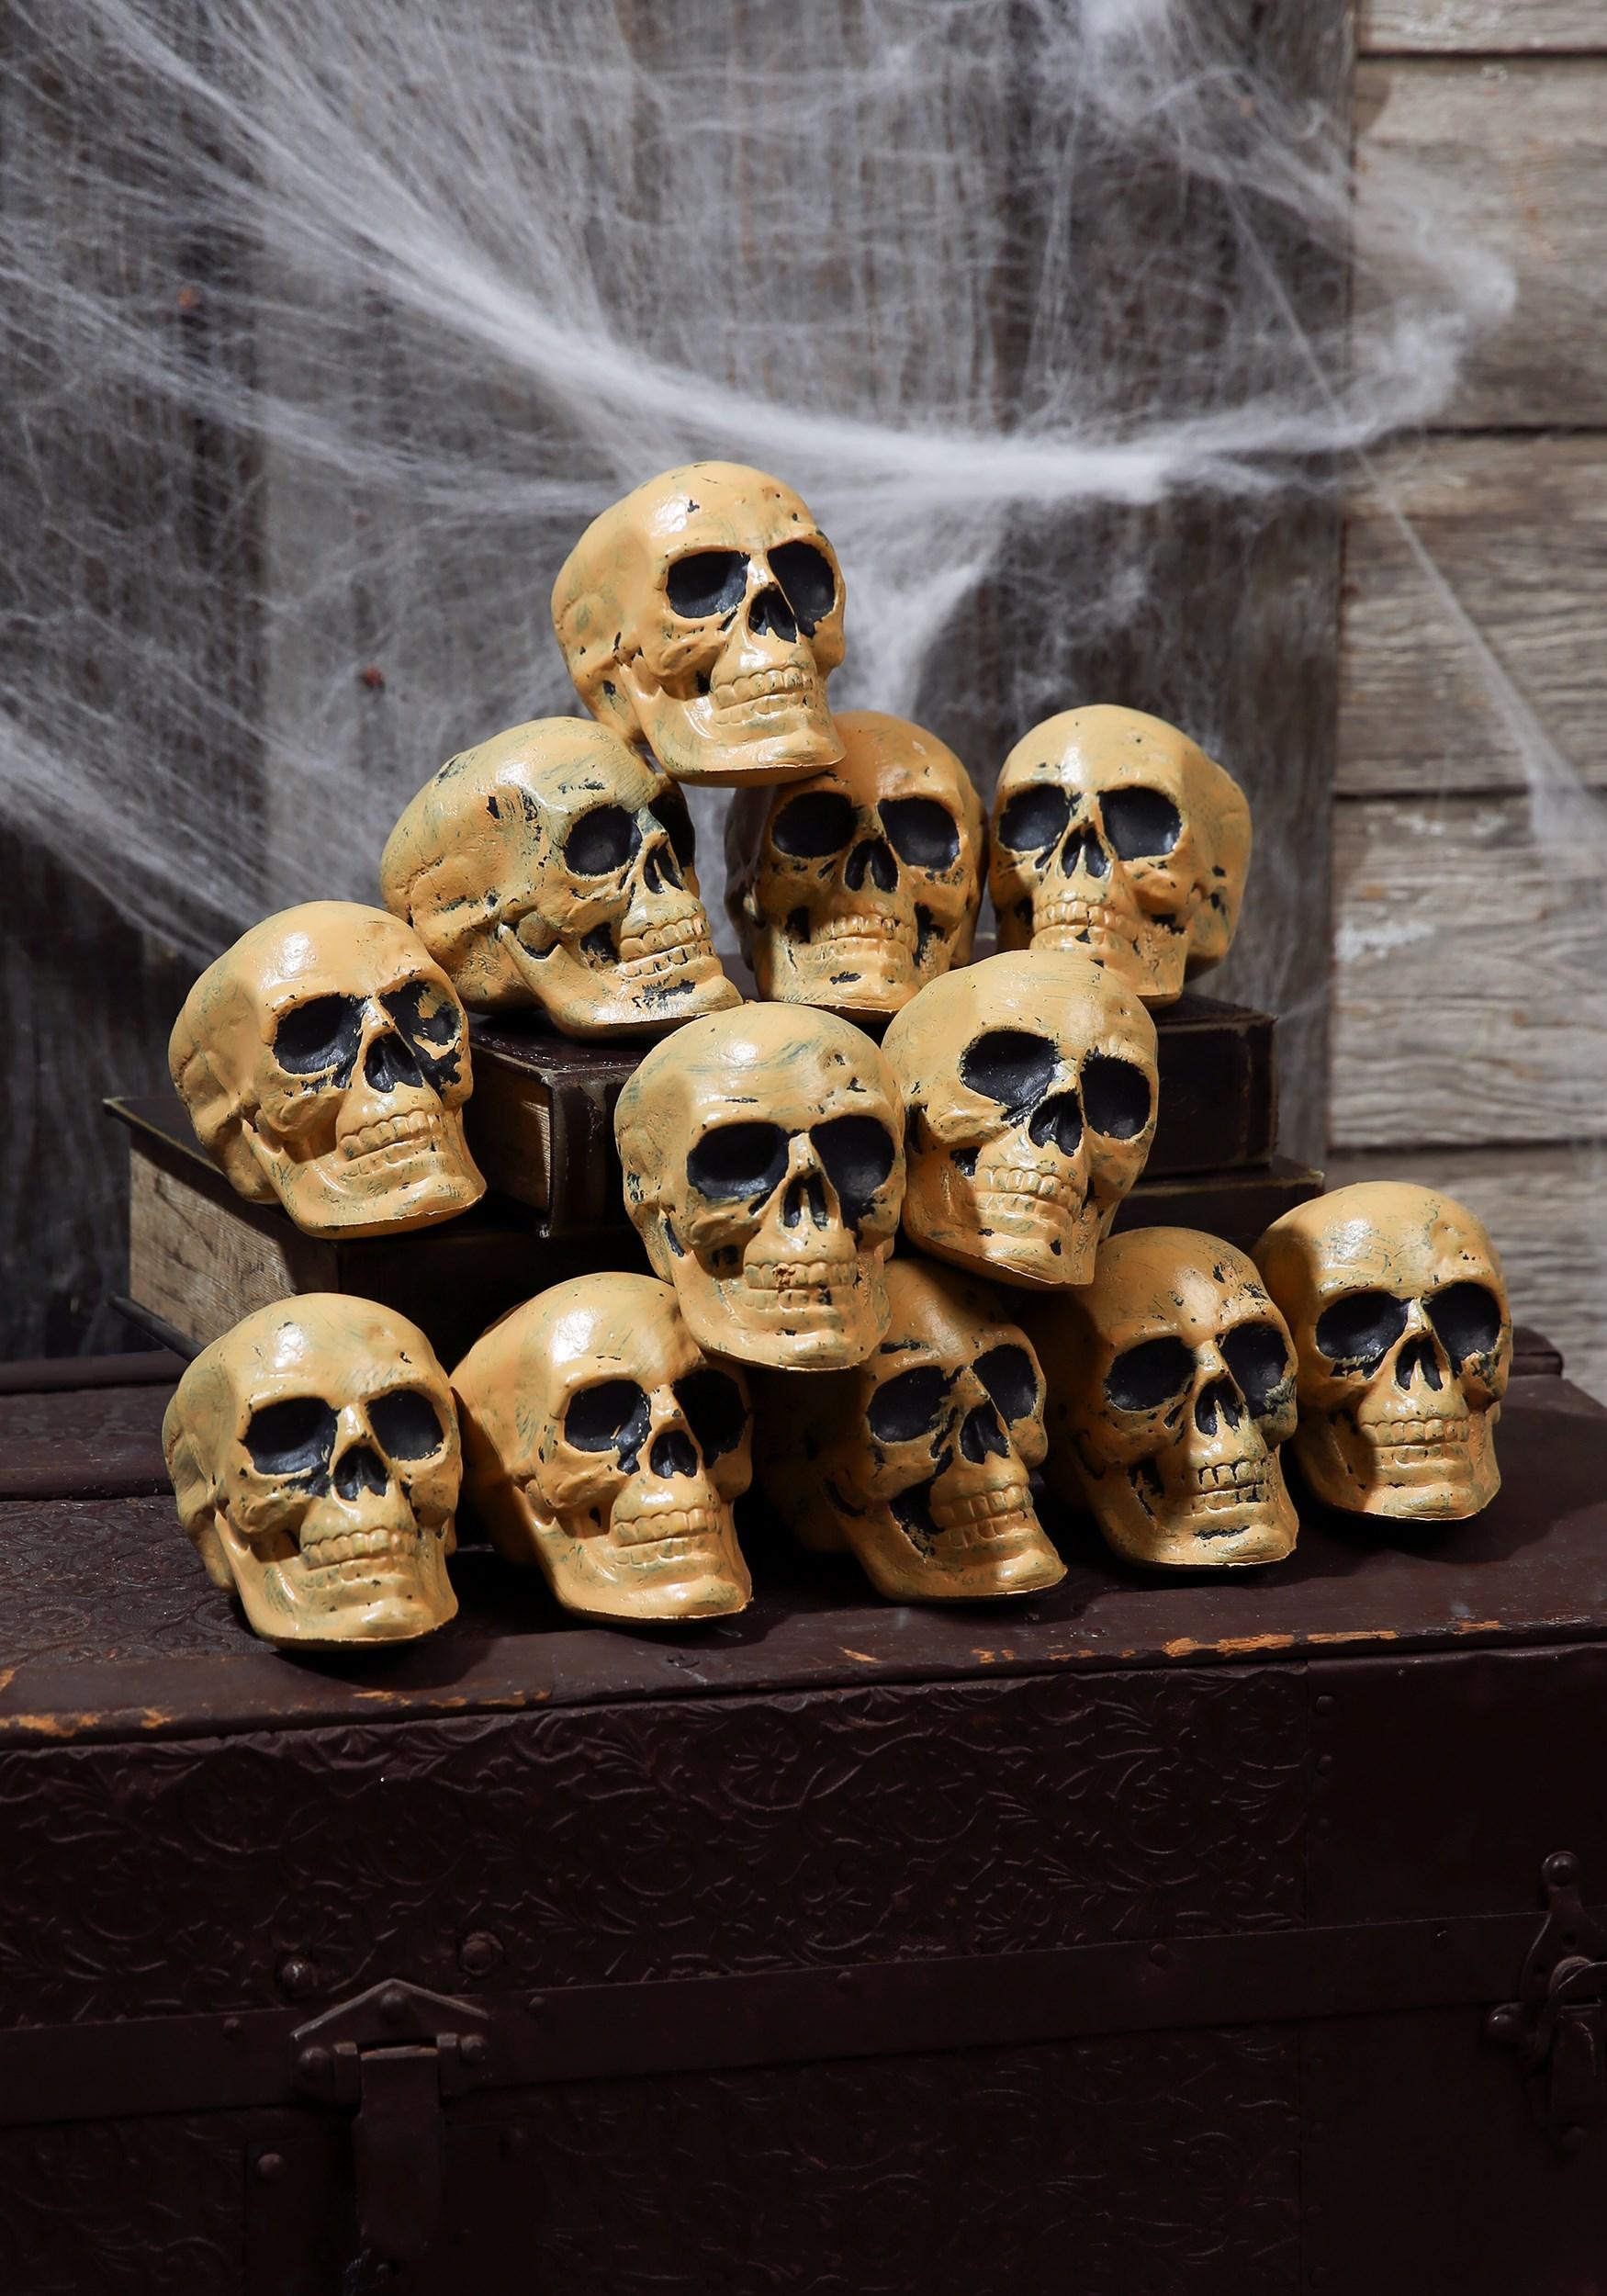 12 Pc. Bag Of Skulls - Skeleton Accessories, Graveyard Decorations